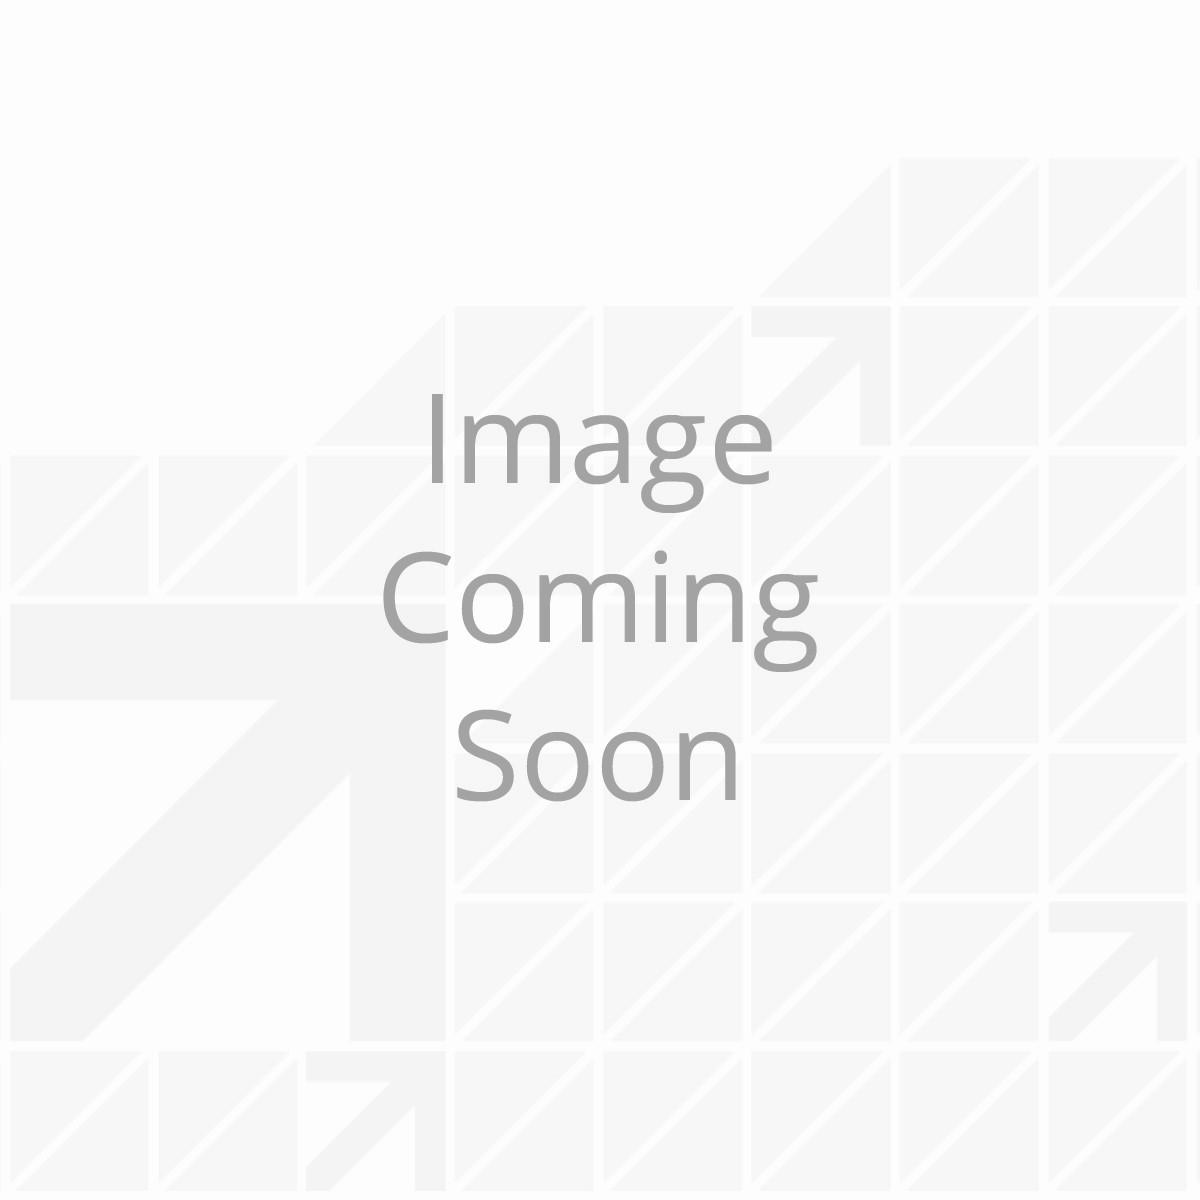 1021 Low VOC Self-Leveling Lap Sealant, White (10.3 Oz. Tube)